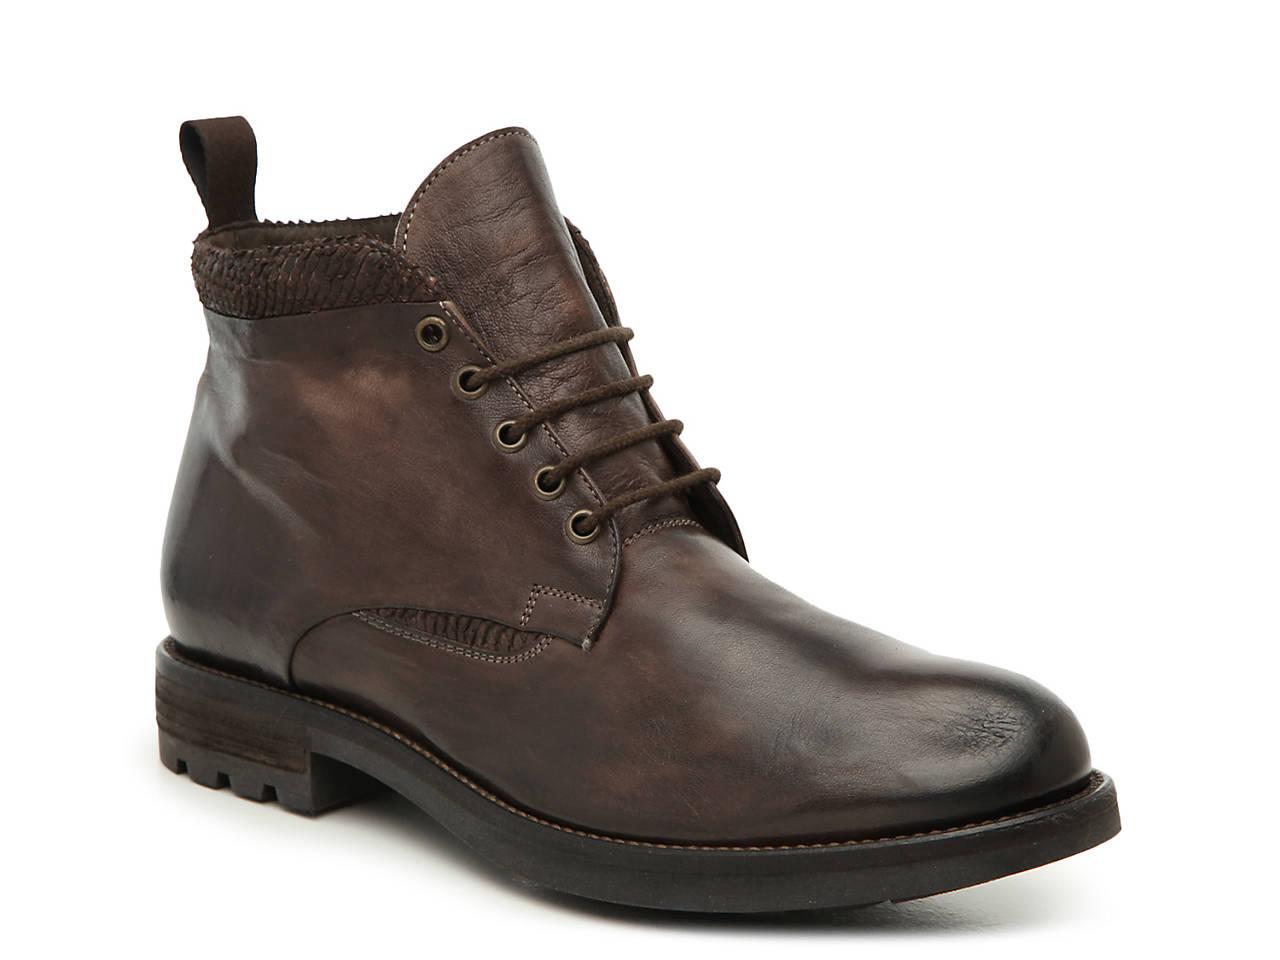 73b2674b1b27 Kenneth Cole New York Design Boot Men s Shoes